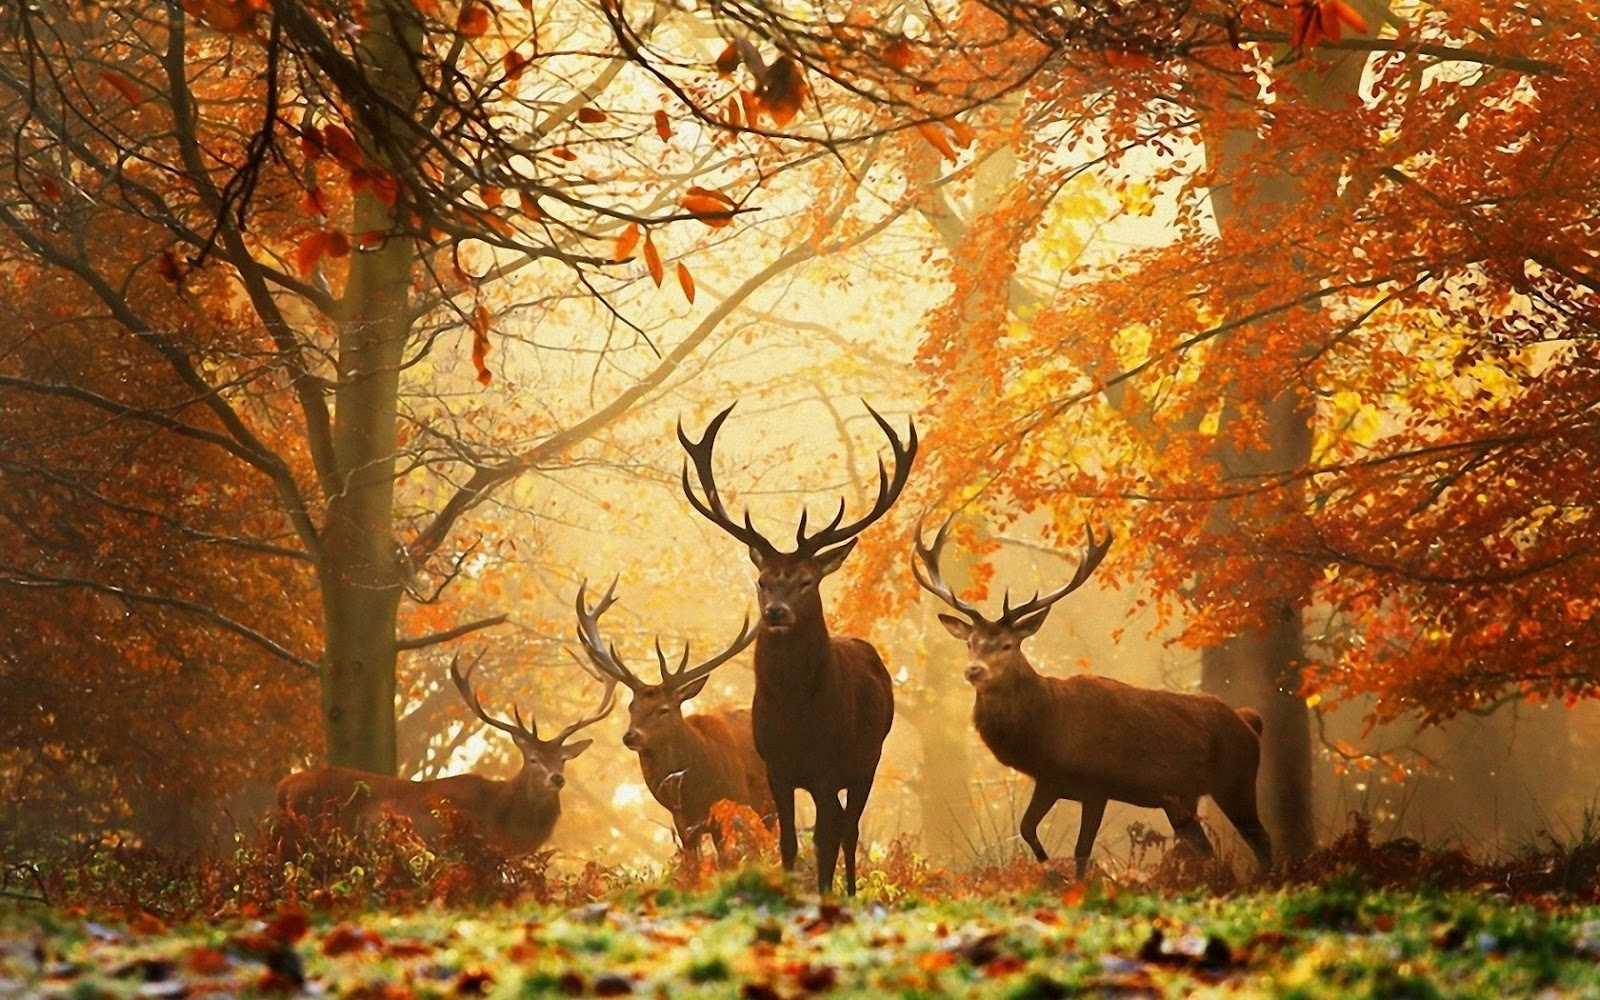 Deer Herd in Forest Autumn HD Nature Wallpaper HD Nature Wallpapers 1600x1000